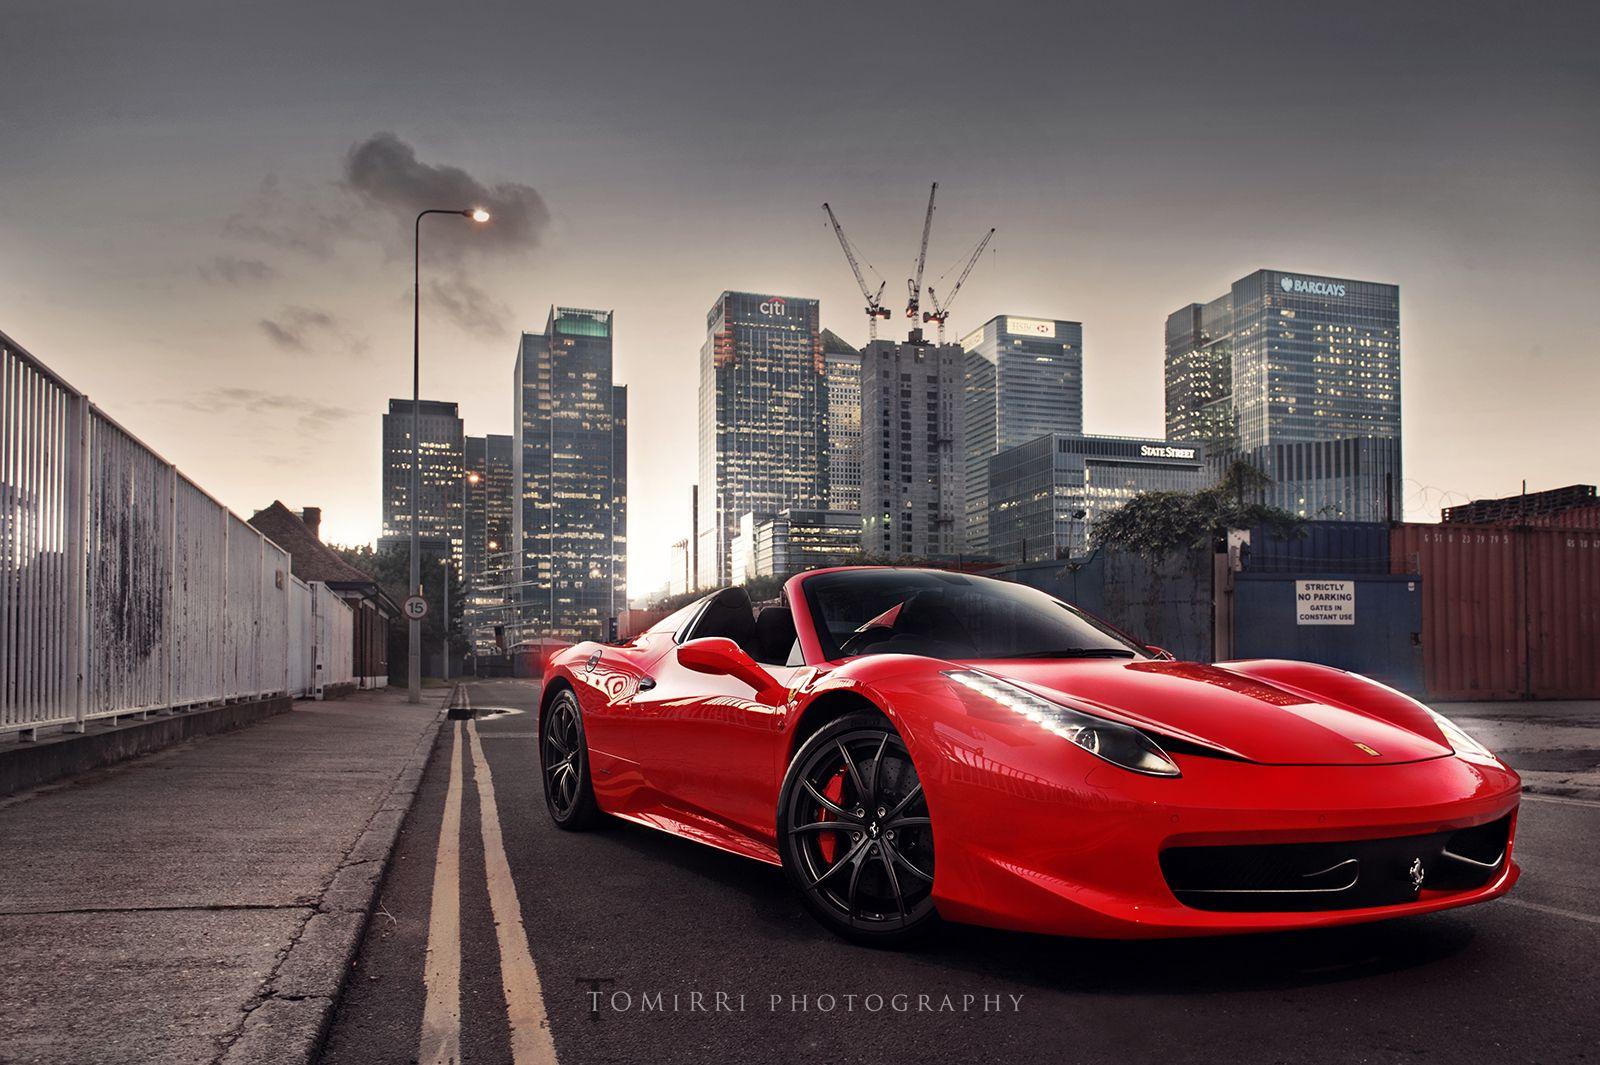 Red Ferrari 458 Italia By Tomirri Photography 1600px Wallpaper